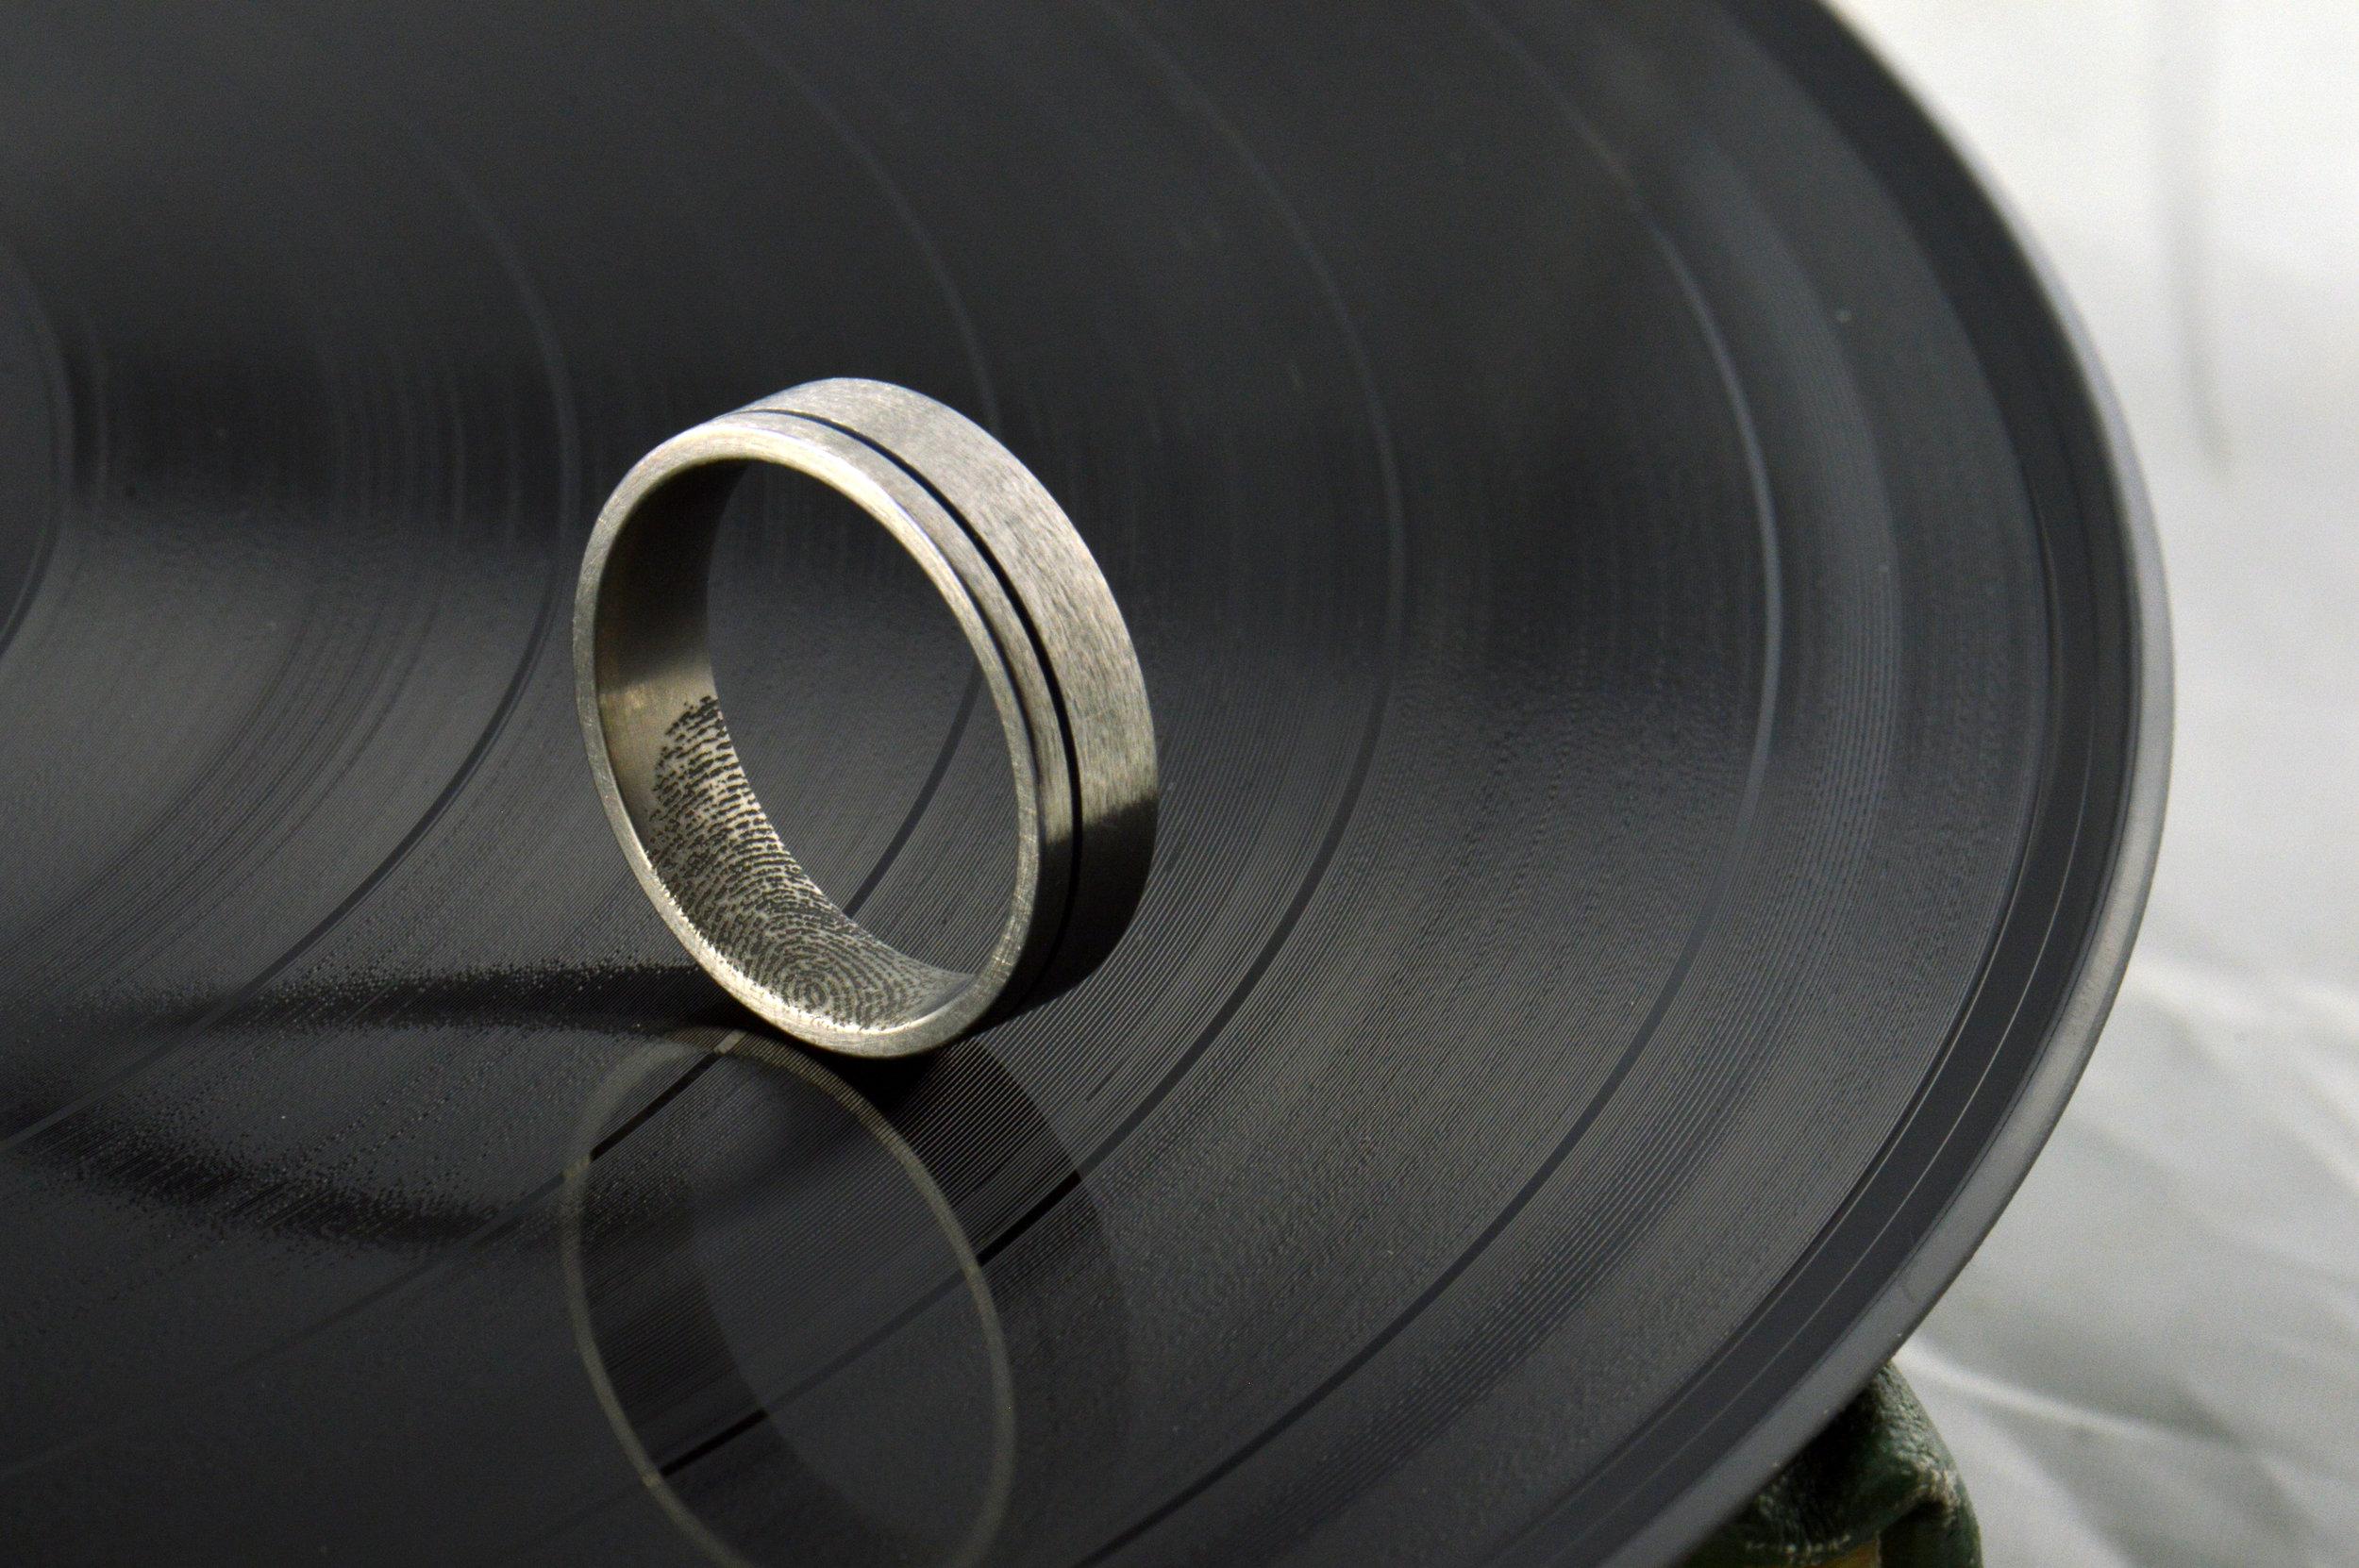 darvier-fingerprint-anodized-wedding-band.JPG